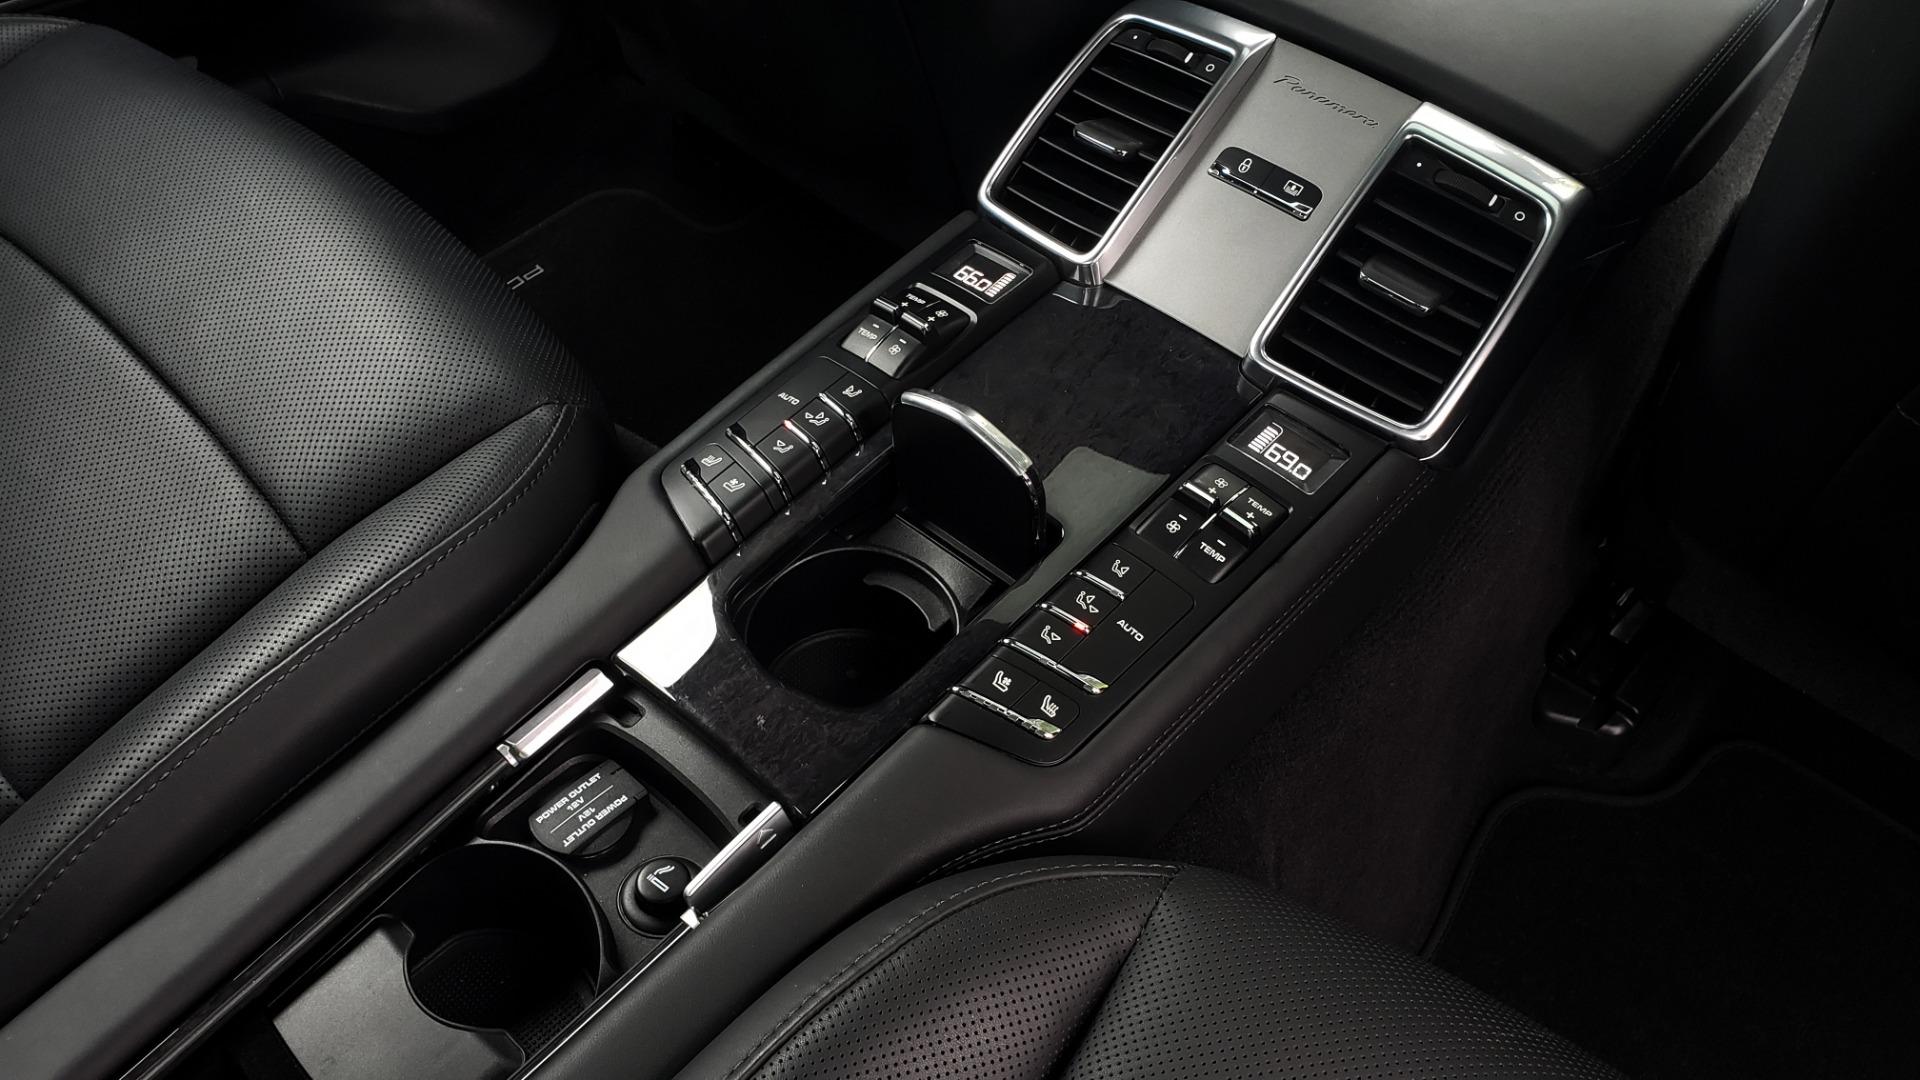 Used 2013 Porsche PANAMERA TURBO 4.8L V8 / AWD / NAV / SUNROOF / LCA / PARK ASST / BURMESTER for sale $45,995 at Formula Imports in Charlotte NC 28227 83